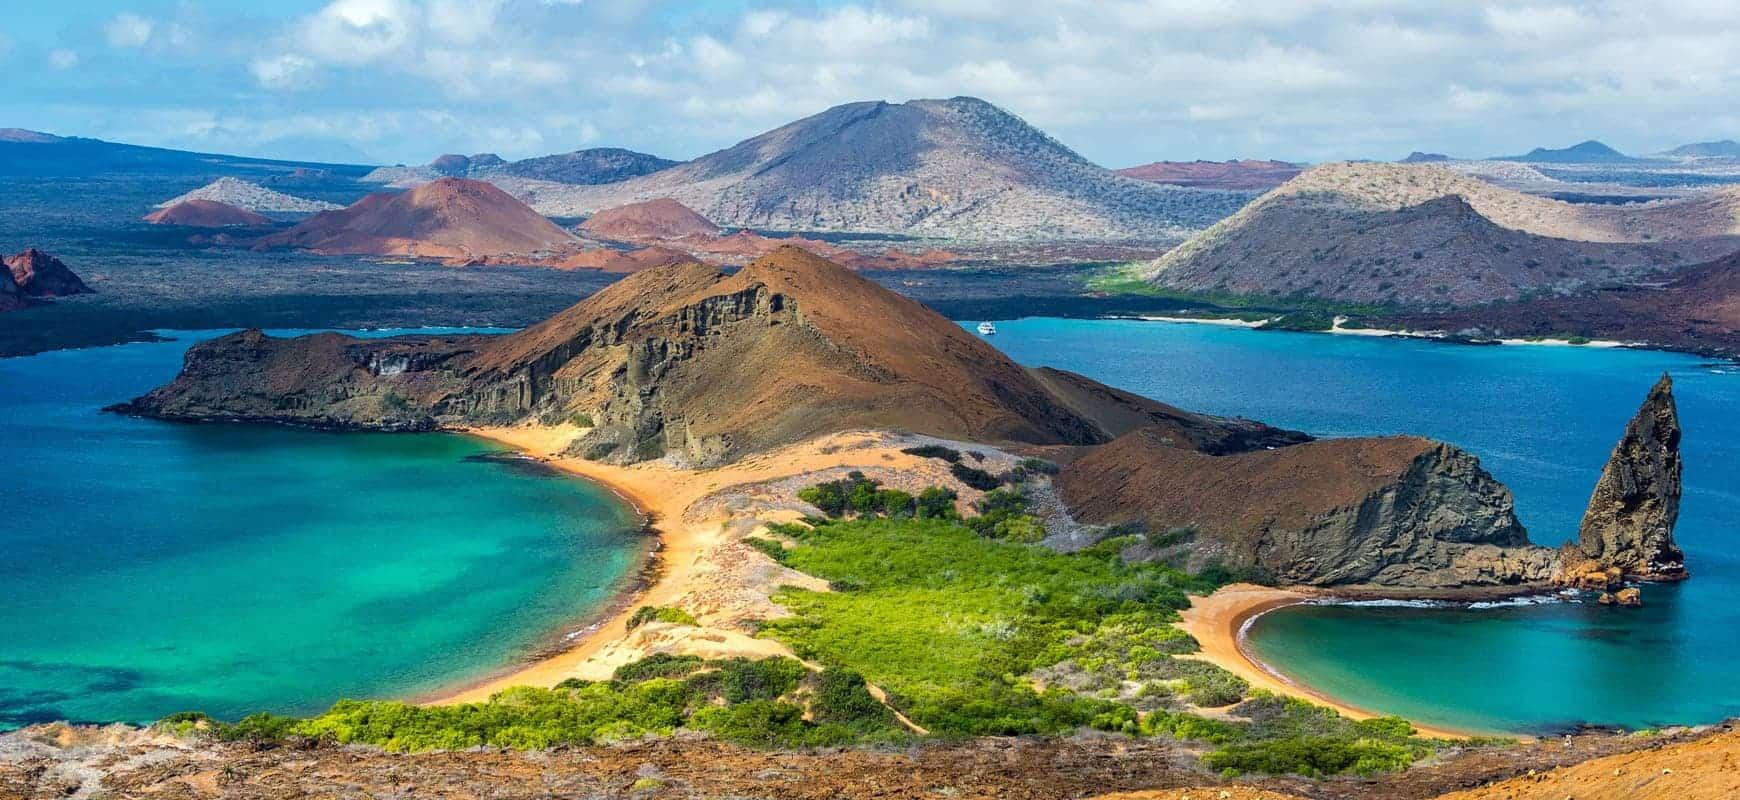 liveaboard-bartolome-island-galapagos-pinnacle-rock-xl